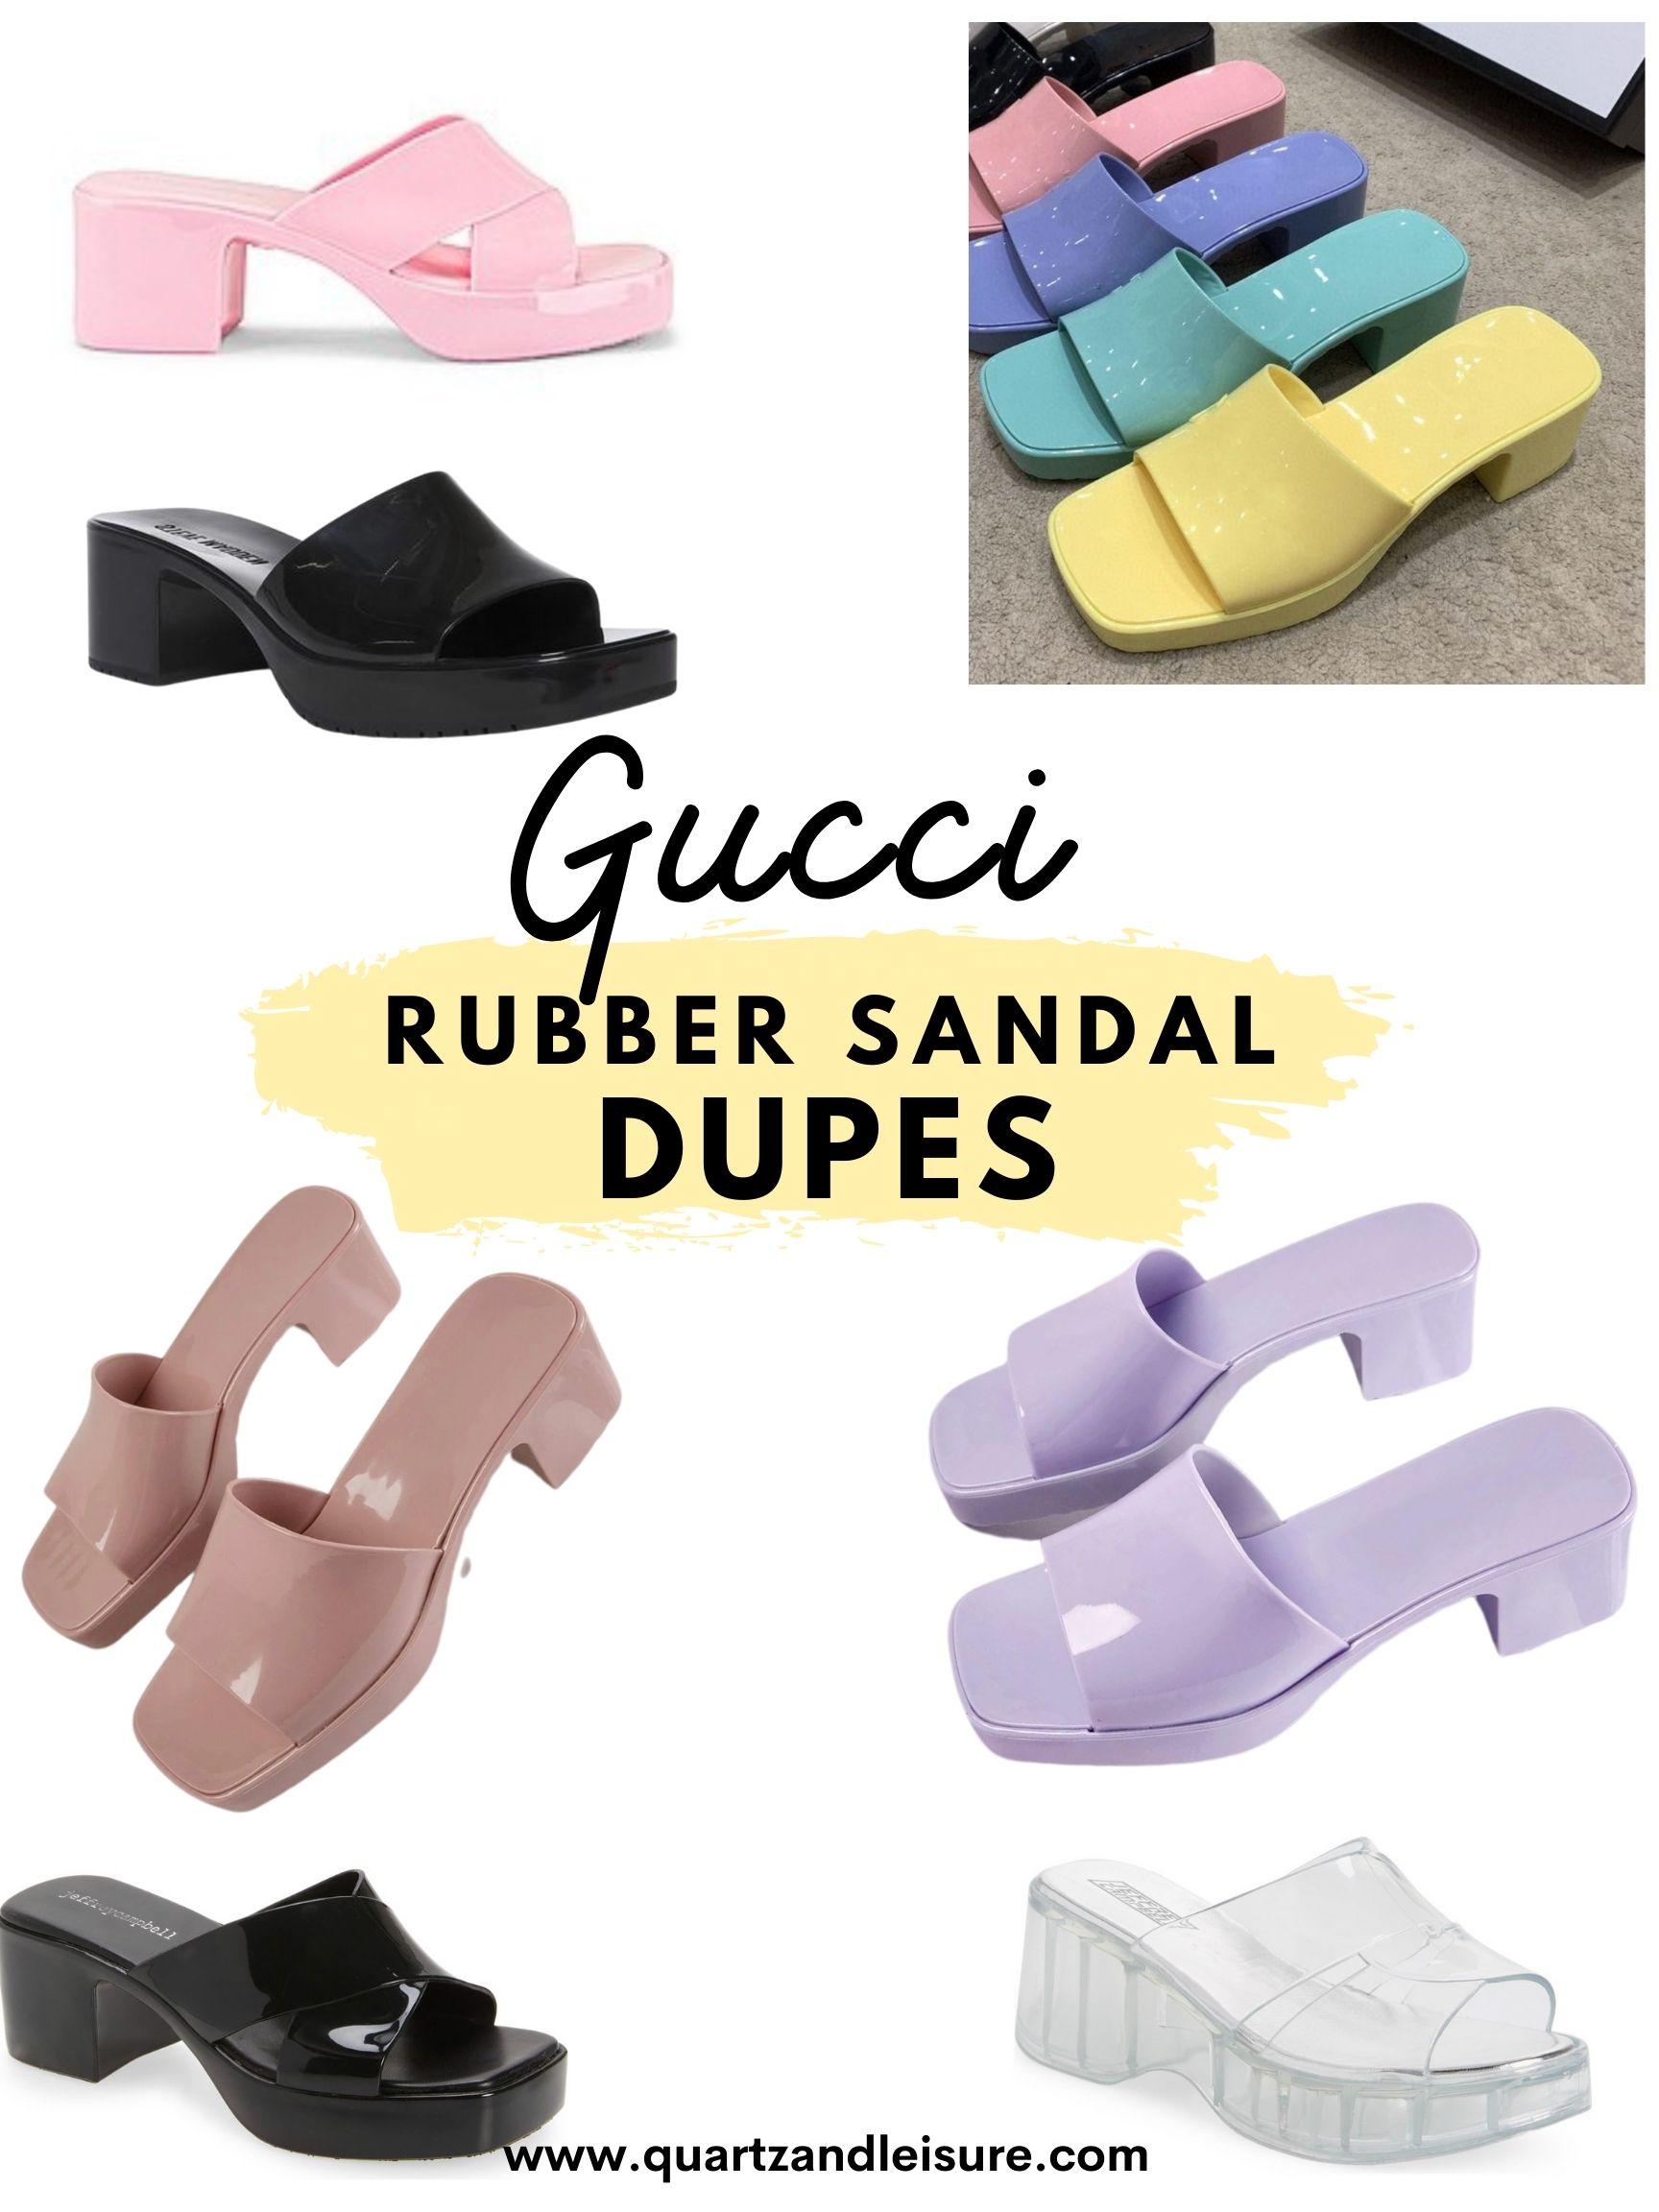 Gucci Rubber Sandal Dupes